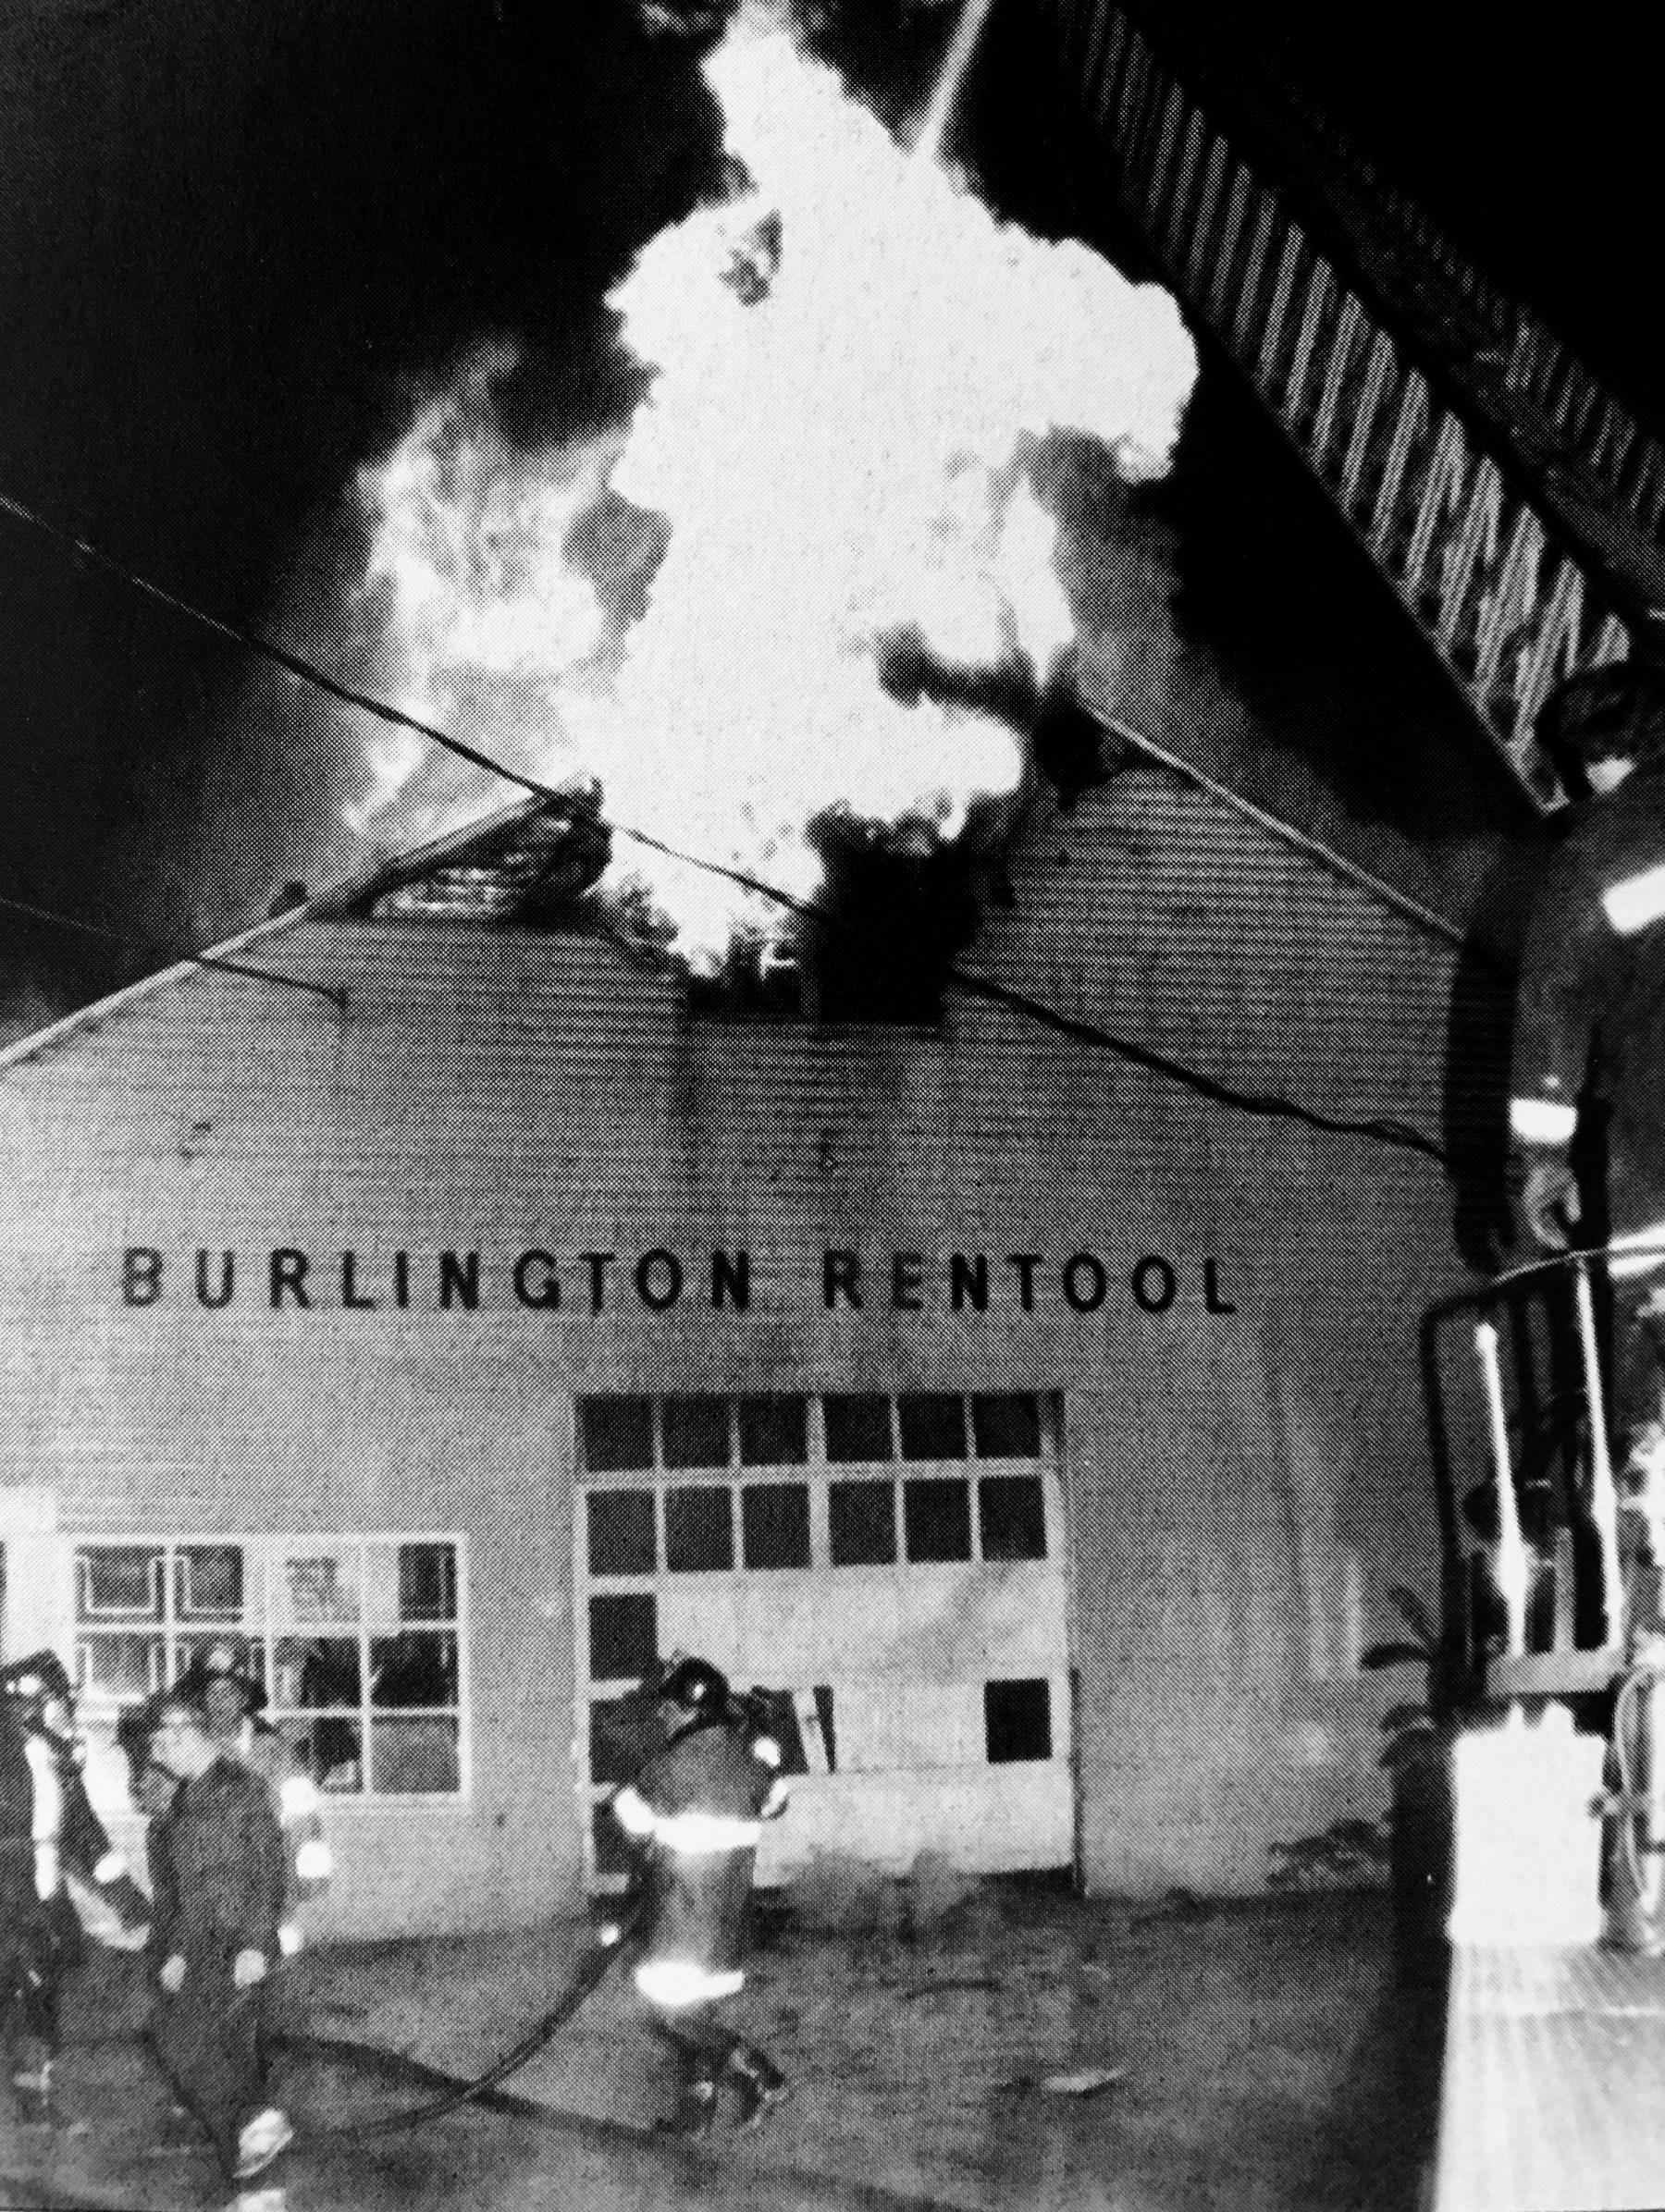 Burlington Rentool fire, 1970